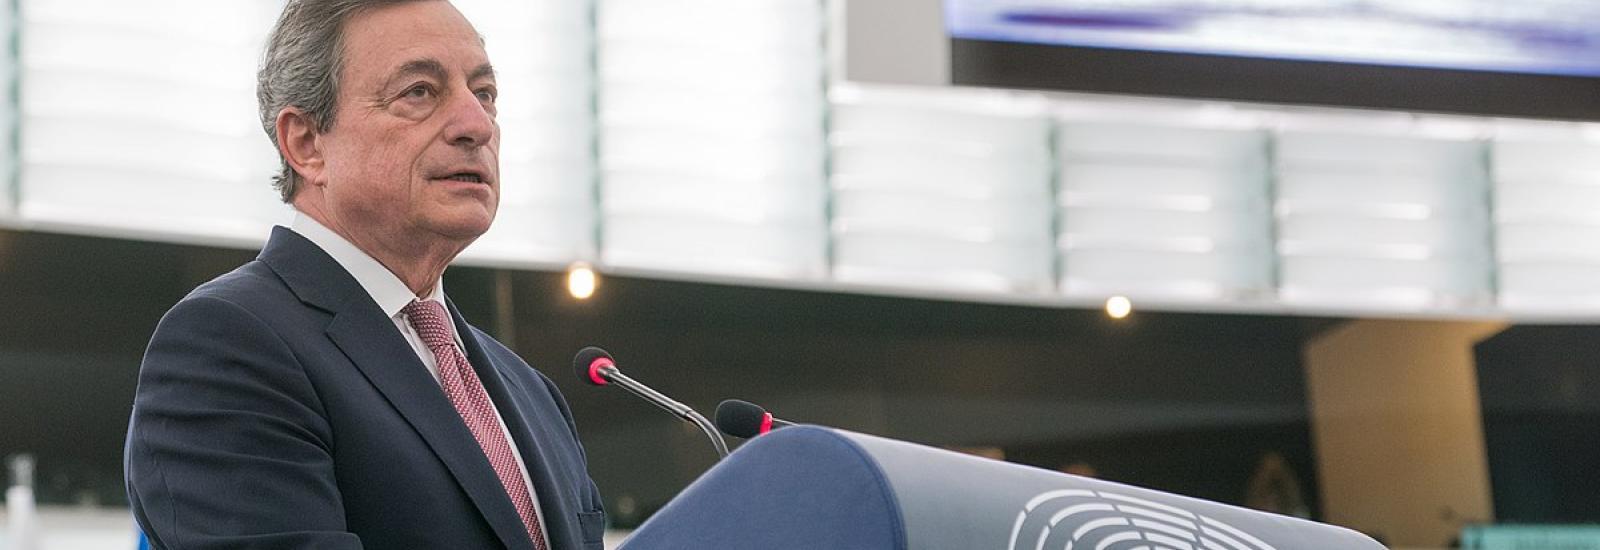 European Parliament from EU, CC BY 2.0, via Wikimedia Commons